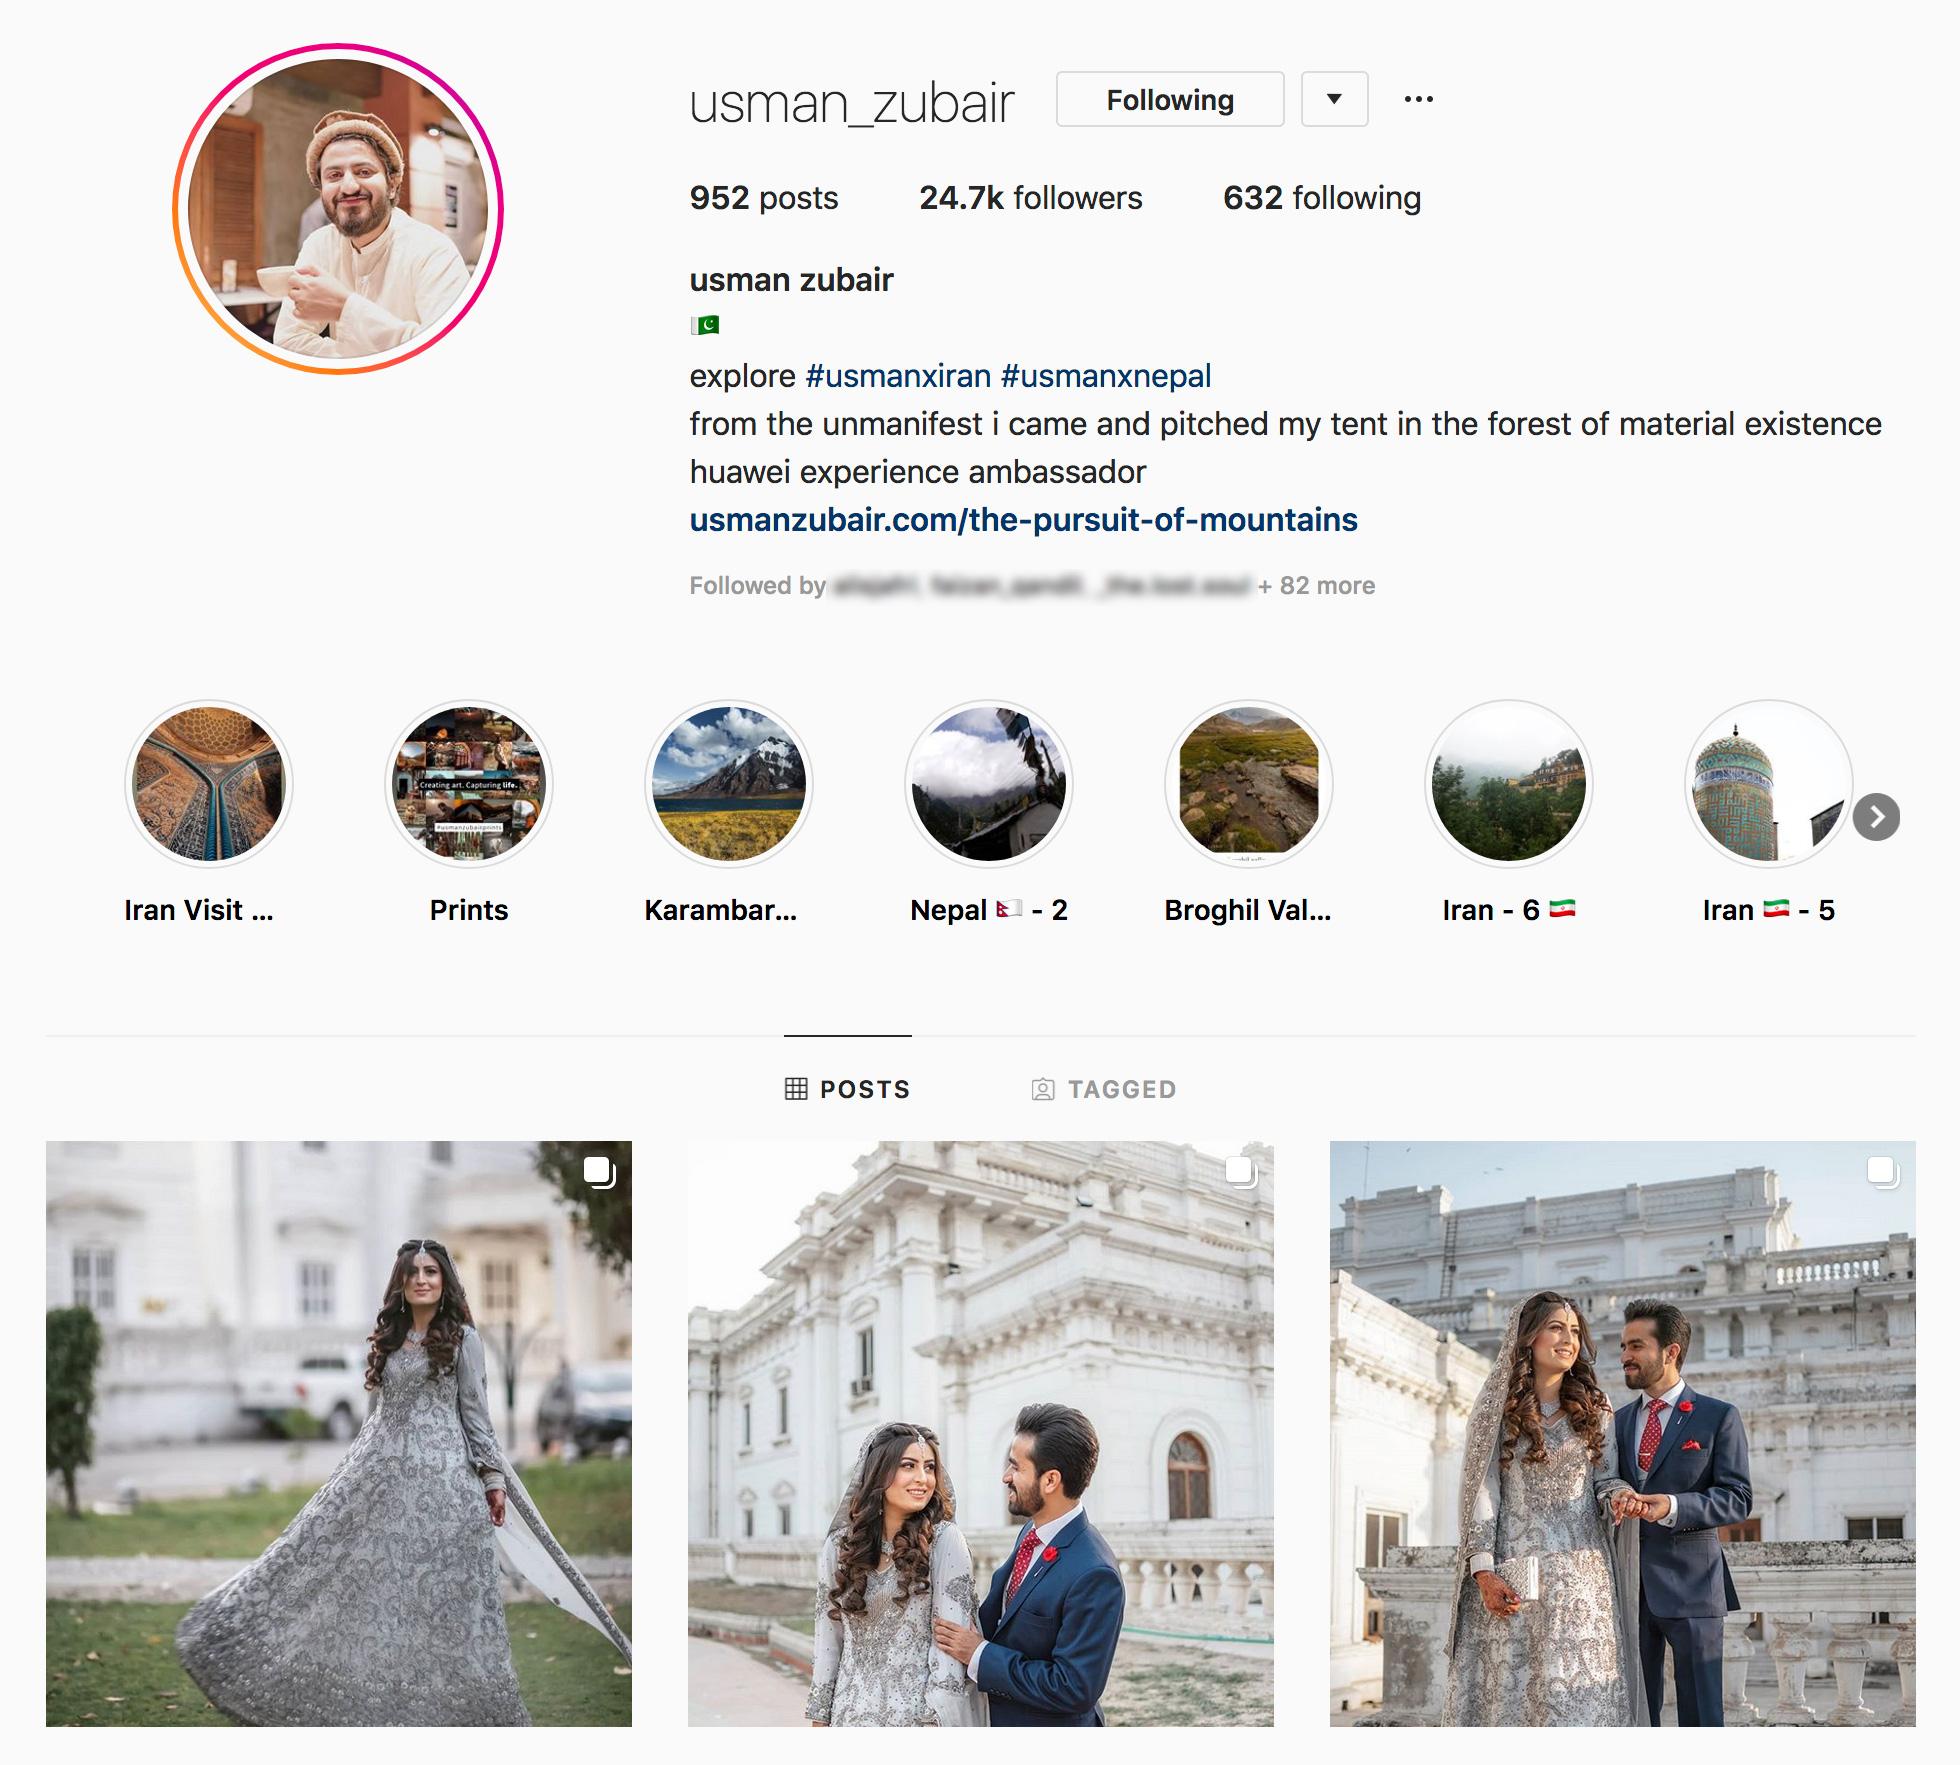 Usman Zubair on Instagram